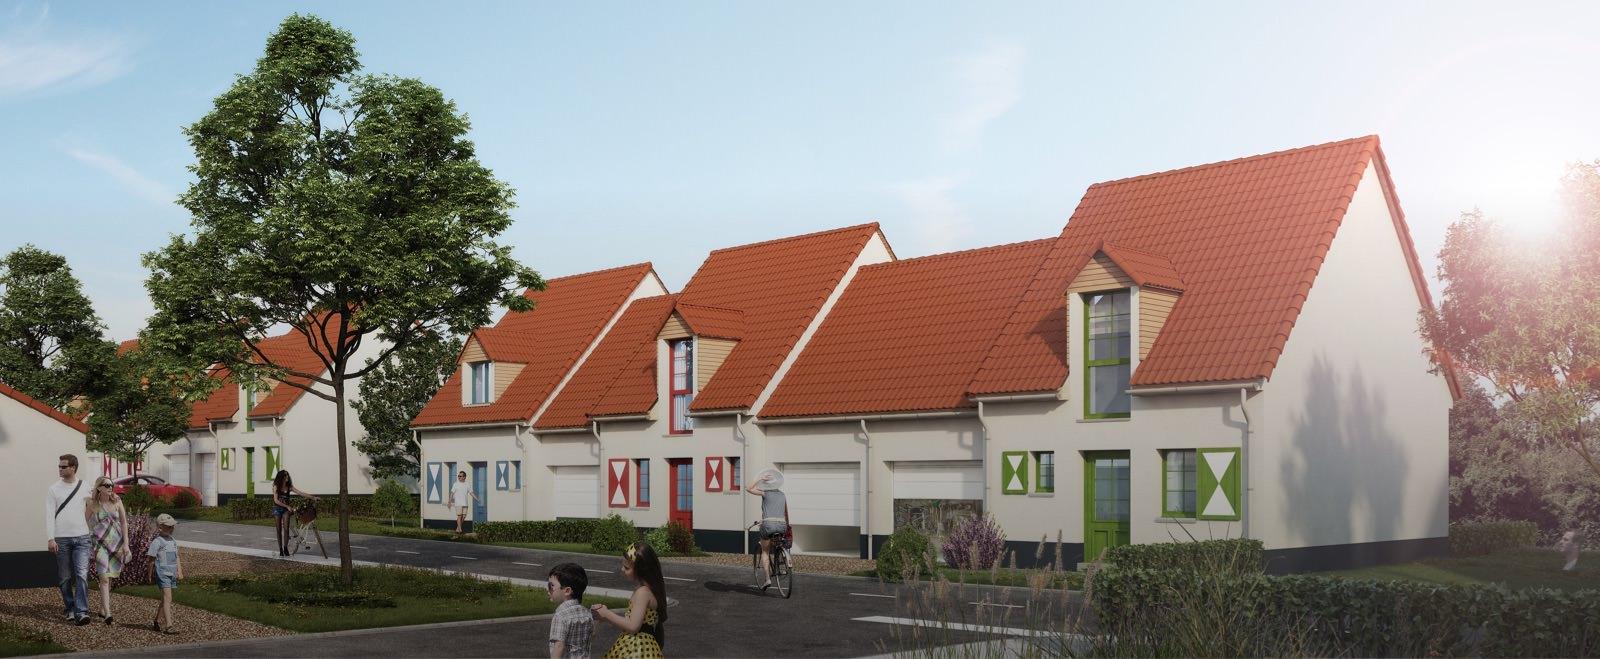 Maison neuve wissant r sidence l 39 envol e sigla neuf for Achat logement neuf